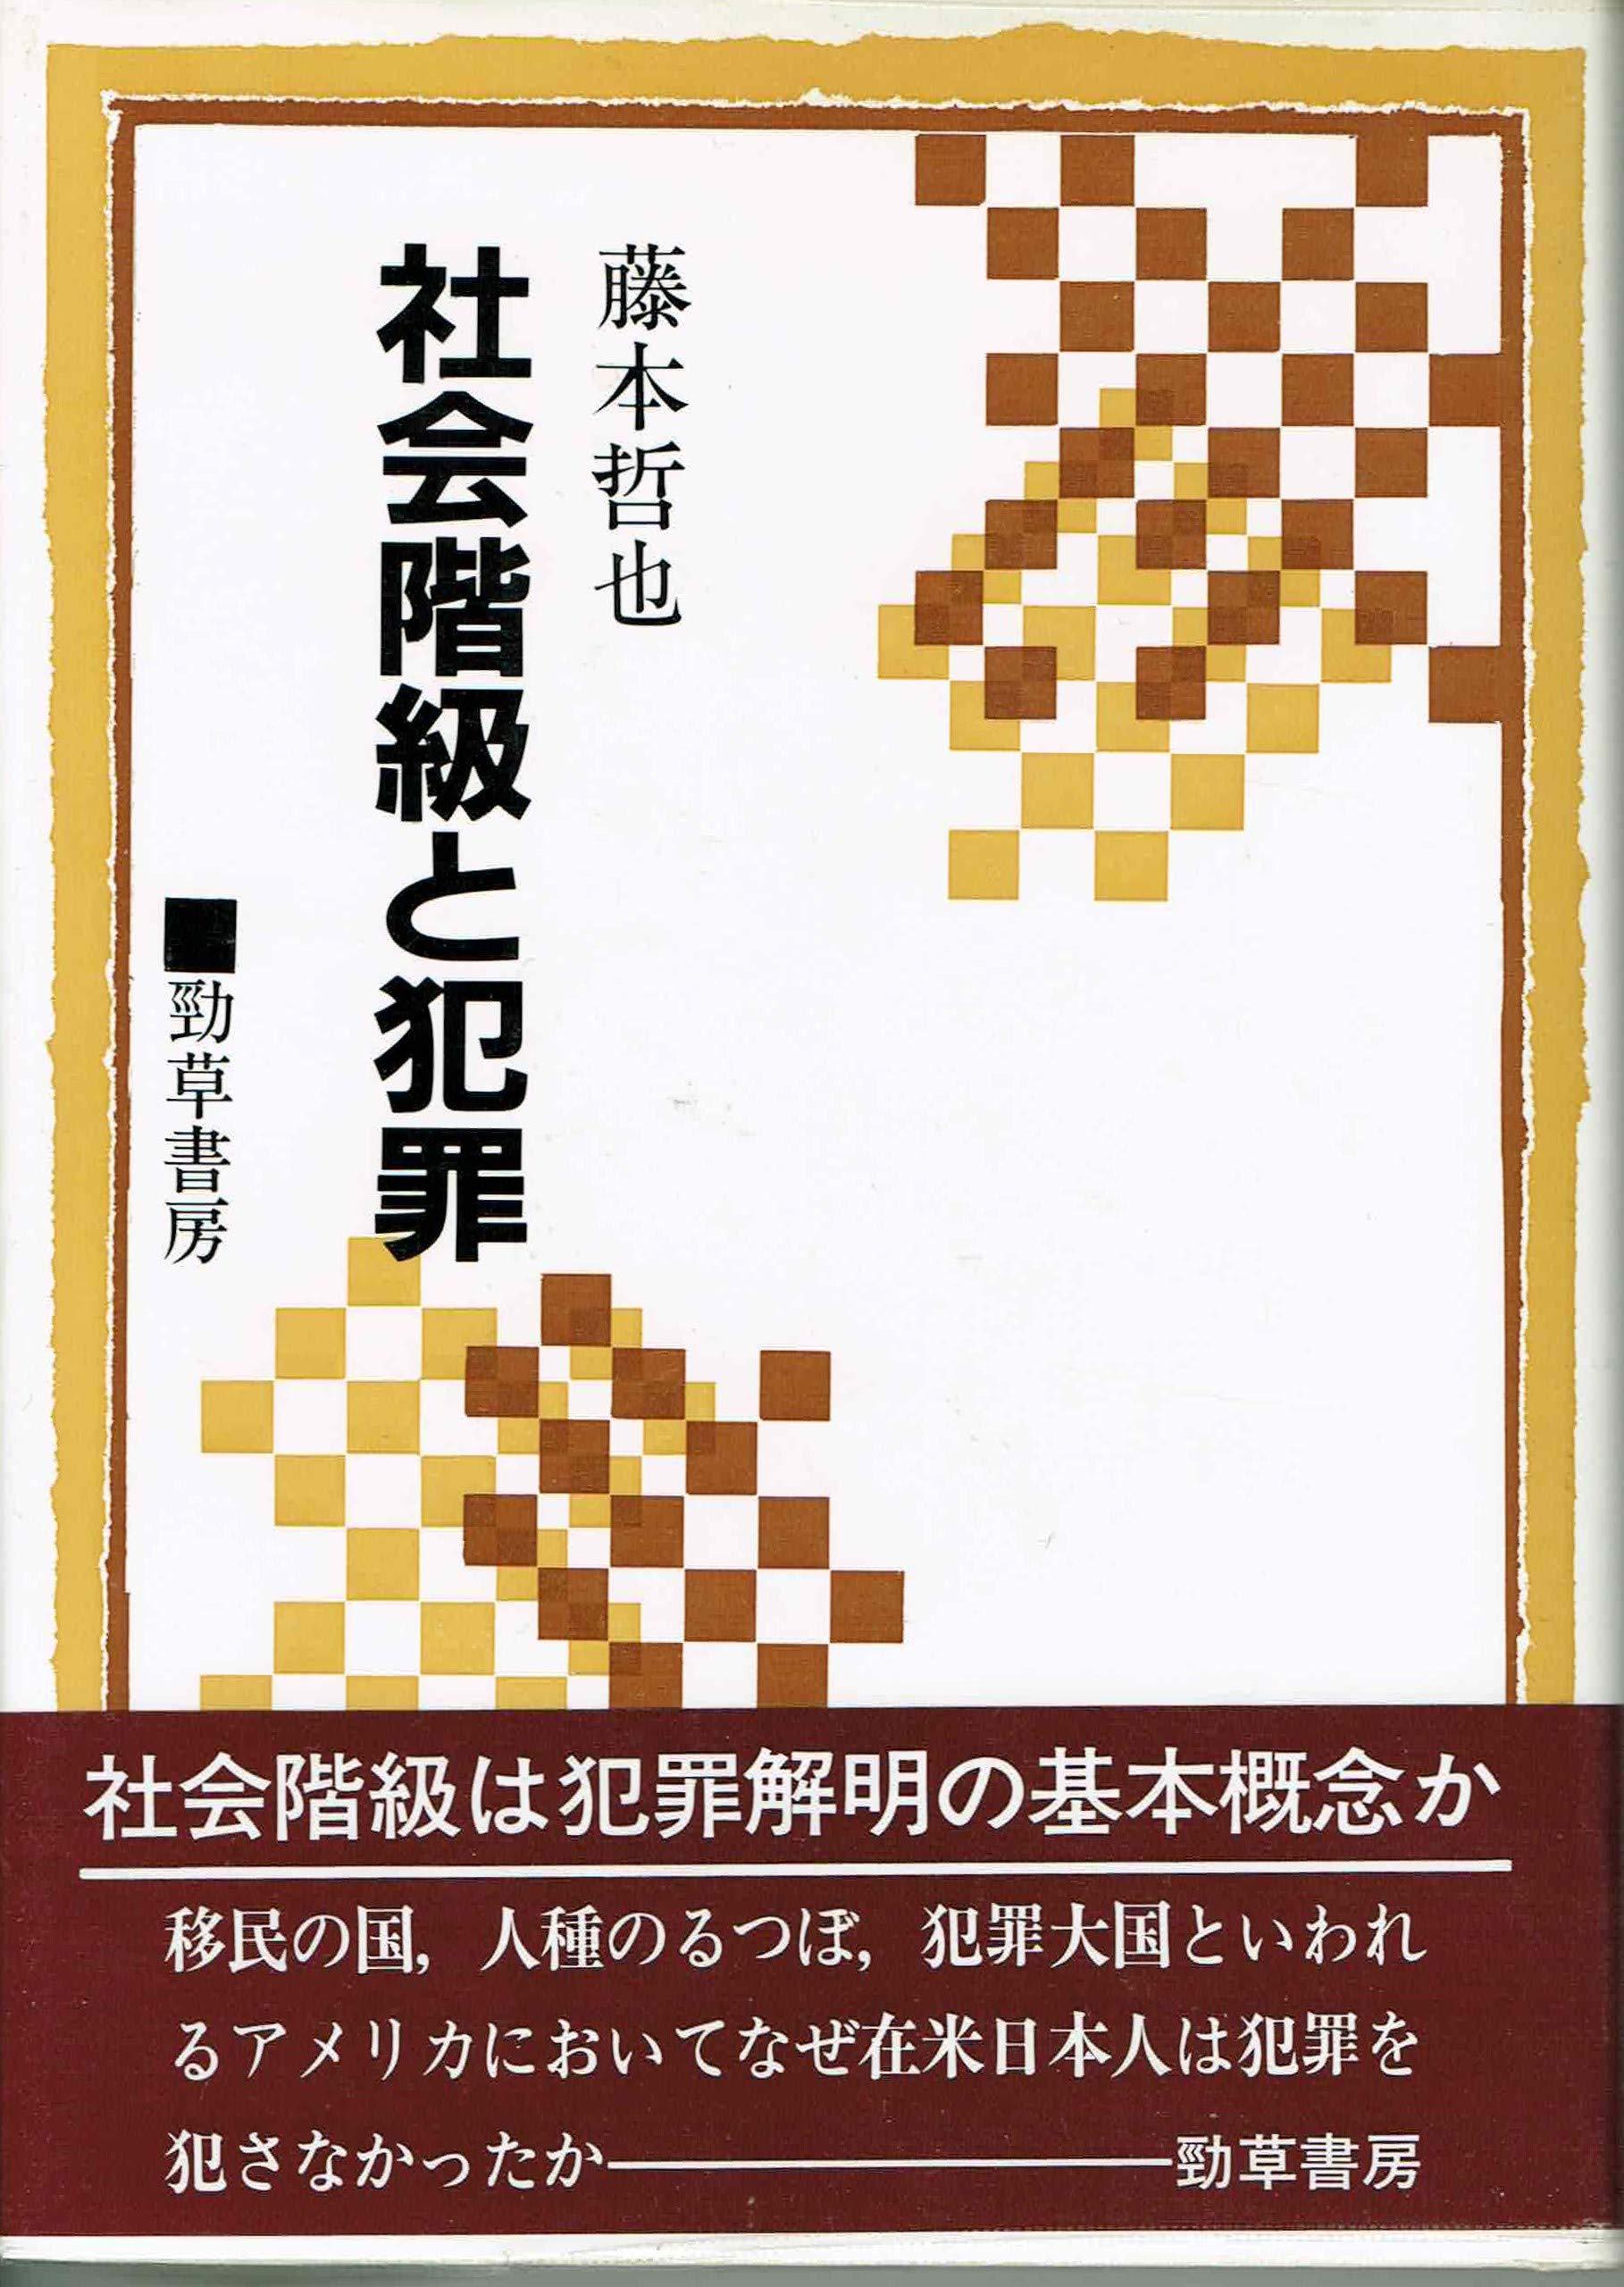 社会階級と犯罪 | 藤本 哲也 |本 | 通販 | Amazon